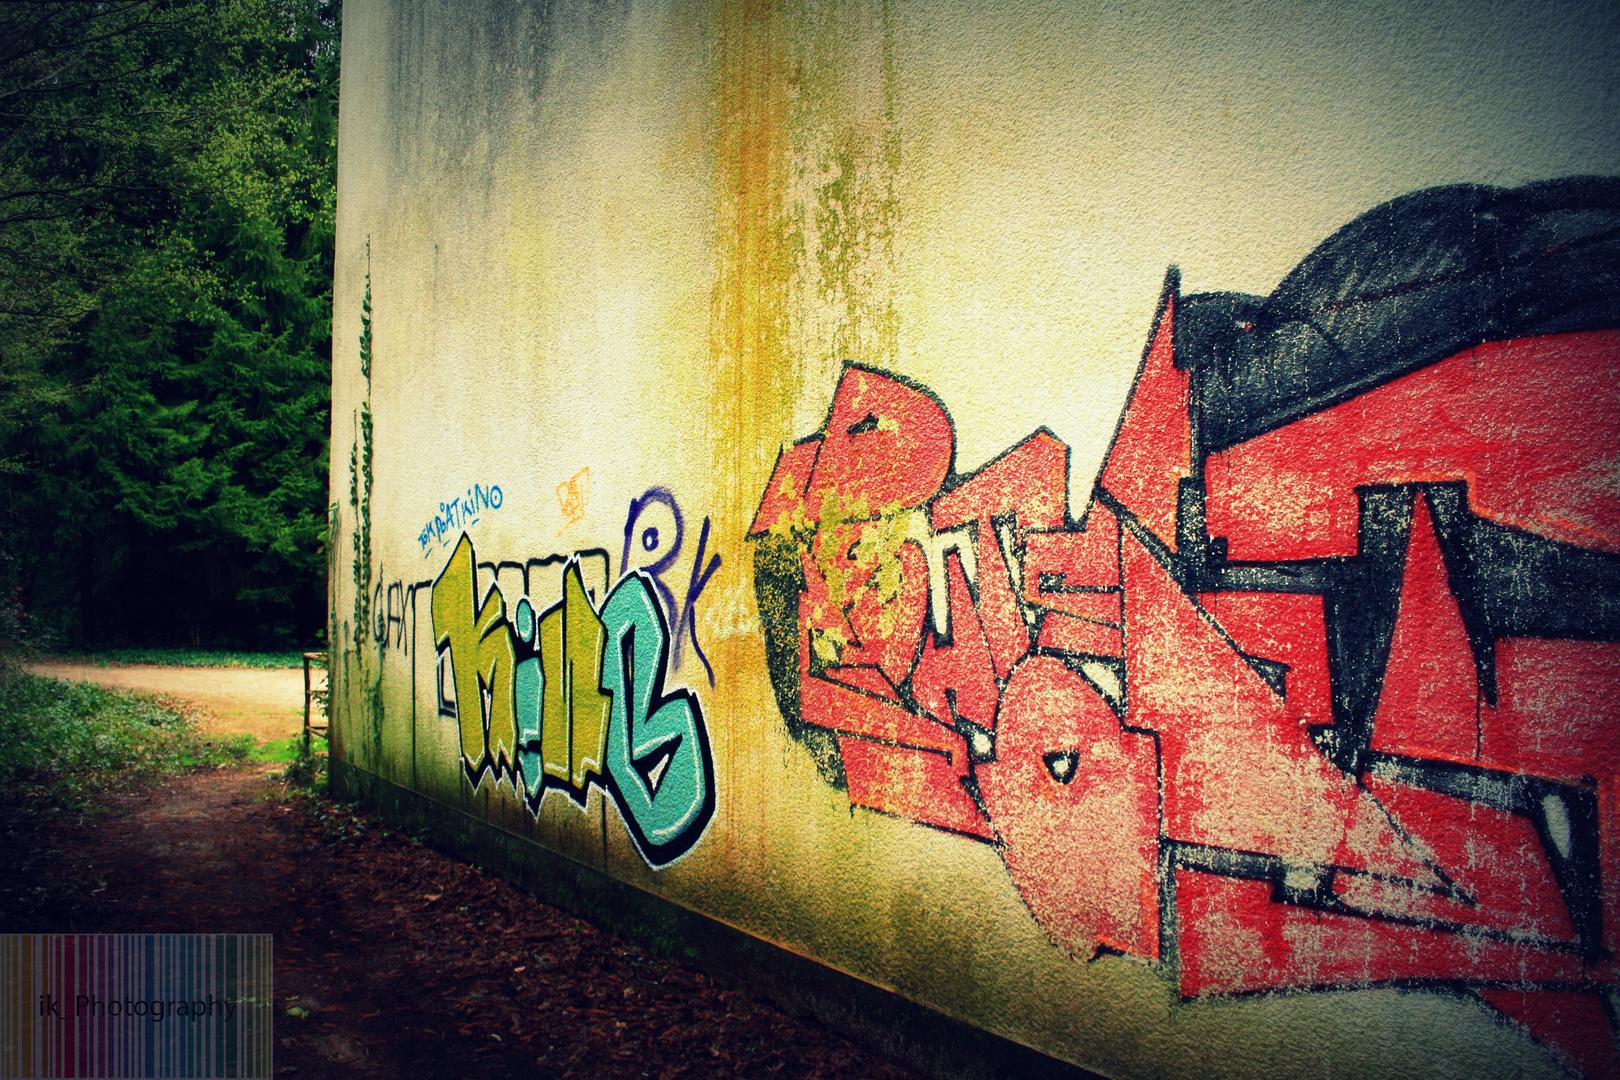 Urban Exploring...